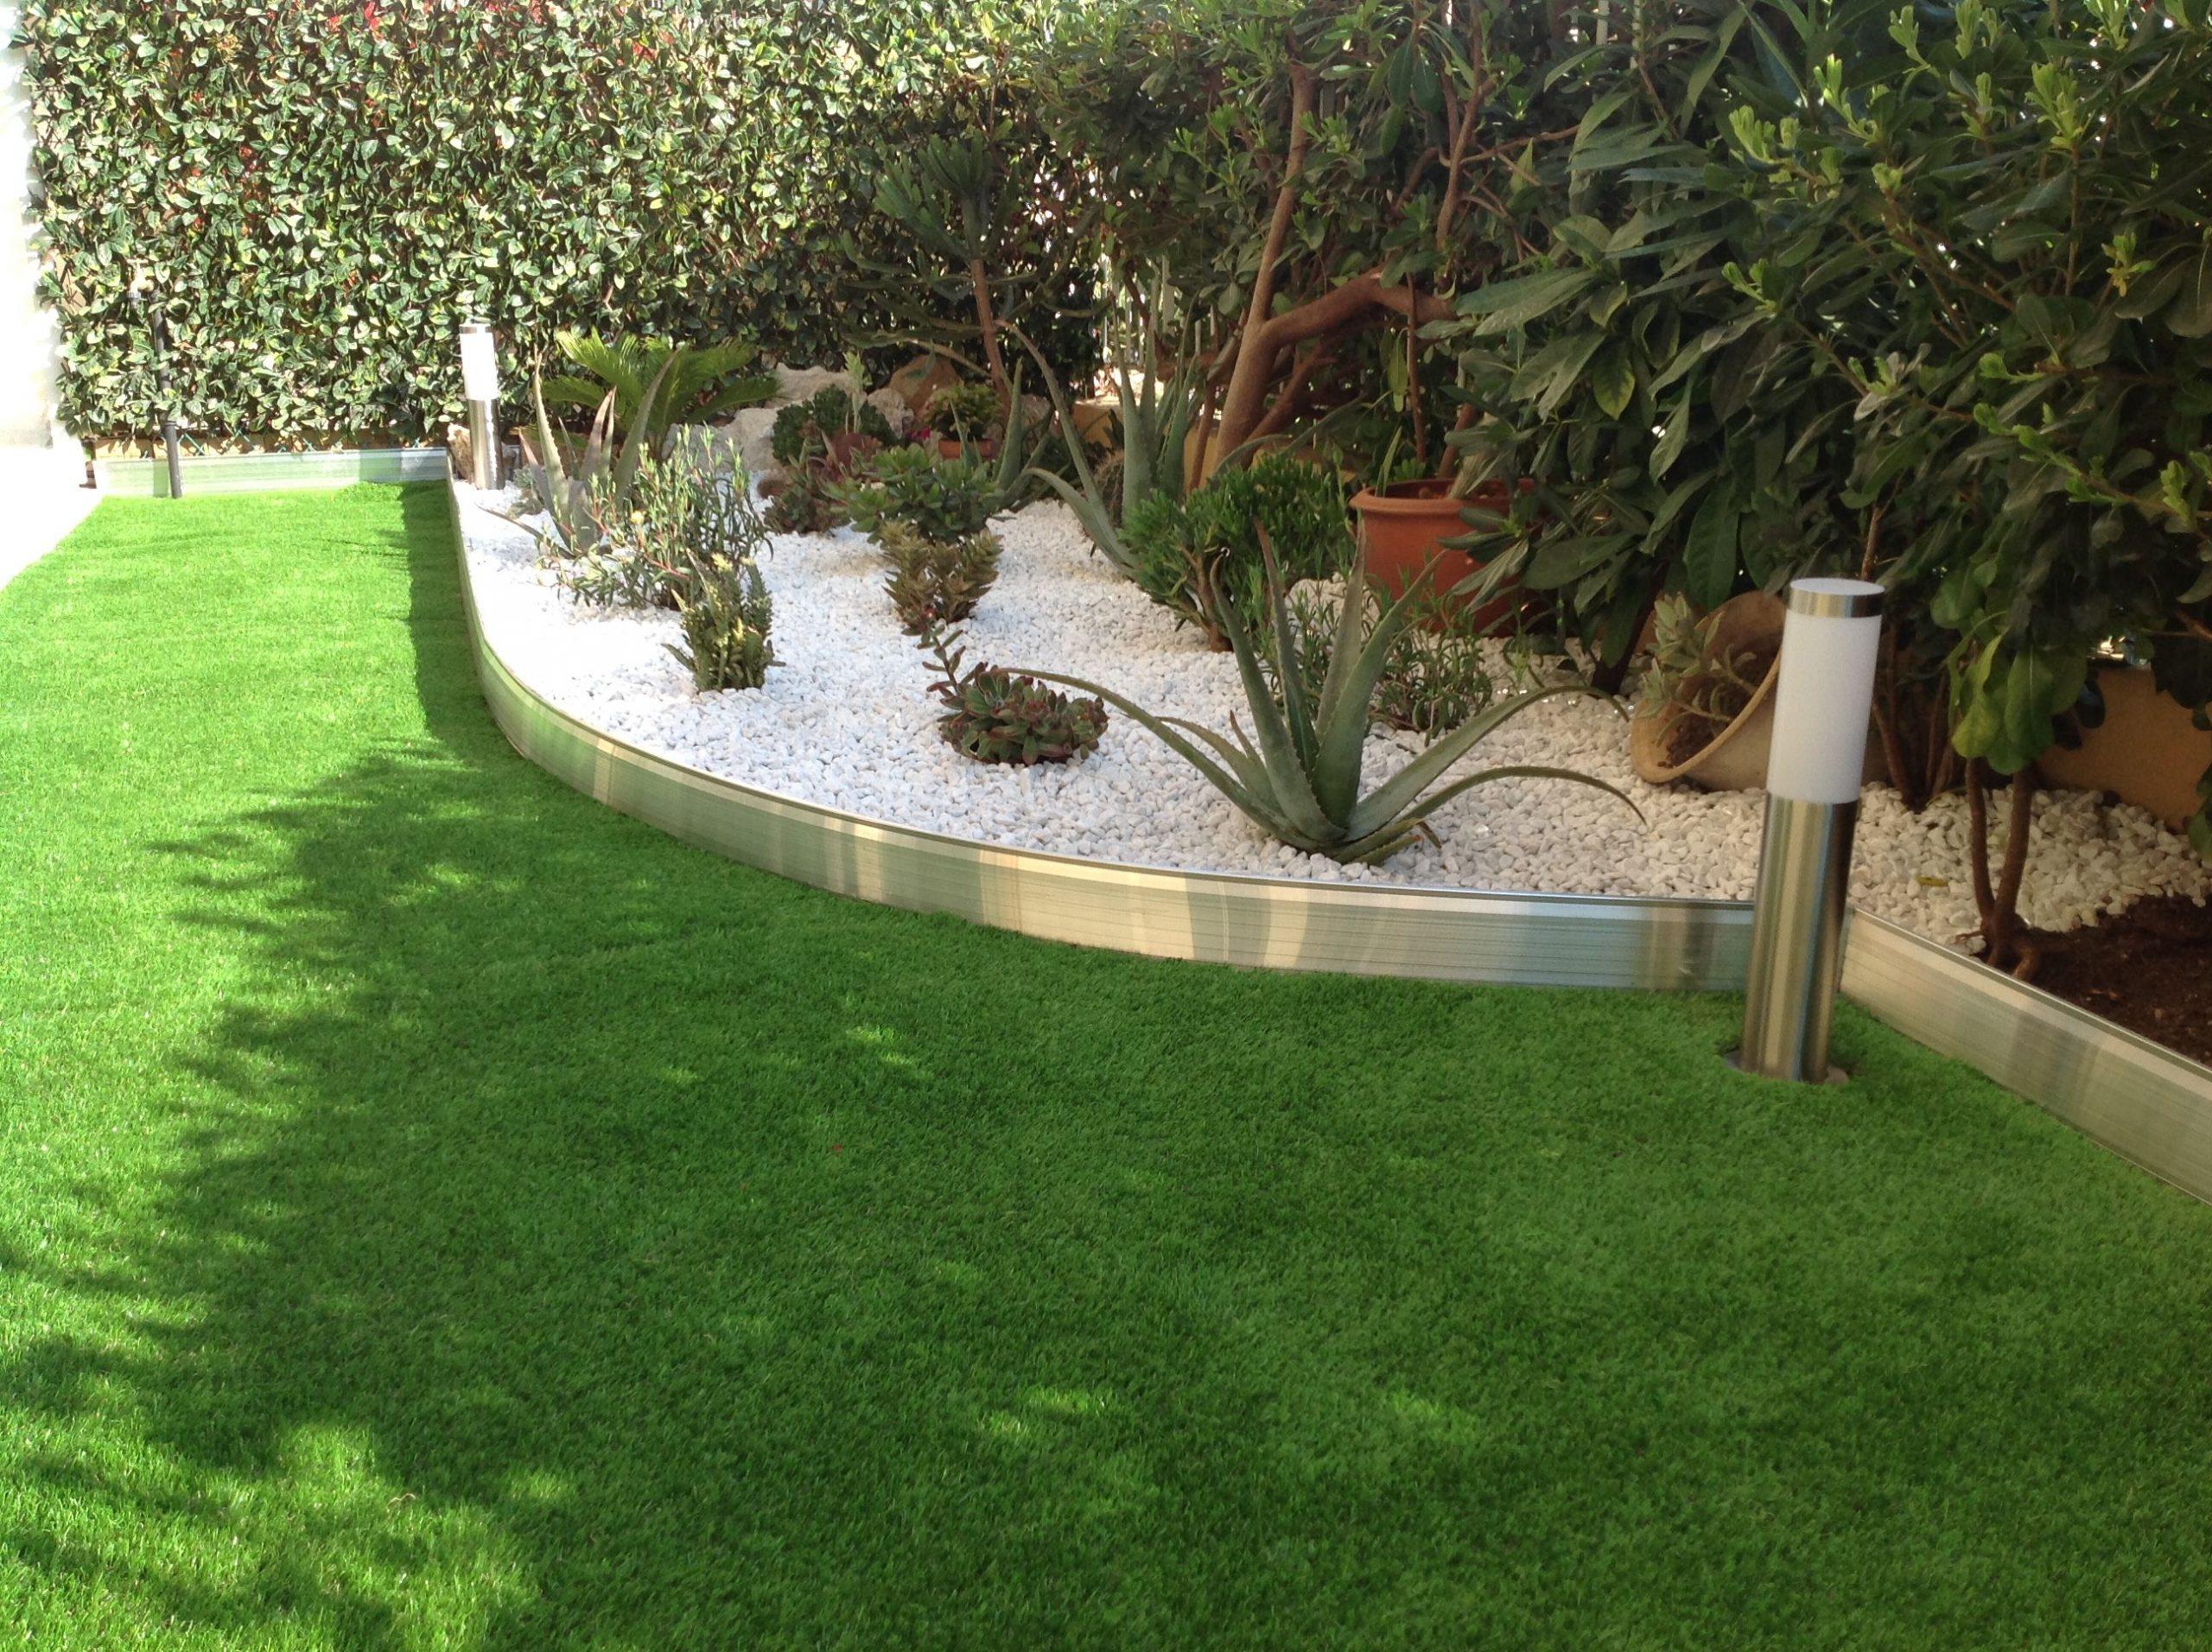 Bordure Originale | Bordure Jardin, Jardins, Parterre De Fleurs pour Delimitation Jardin